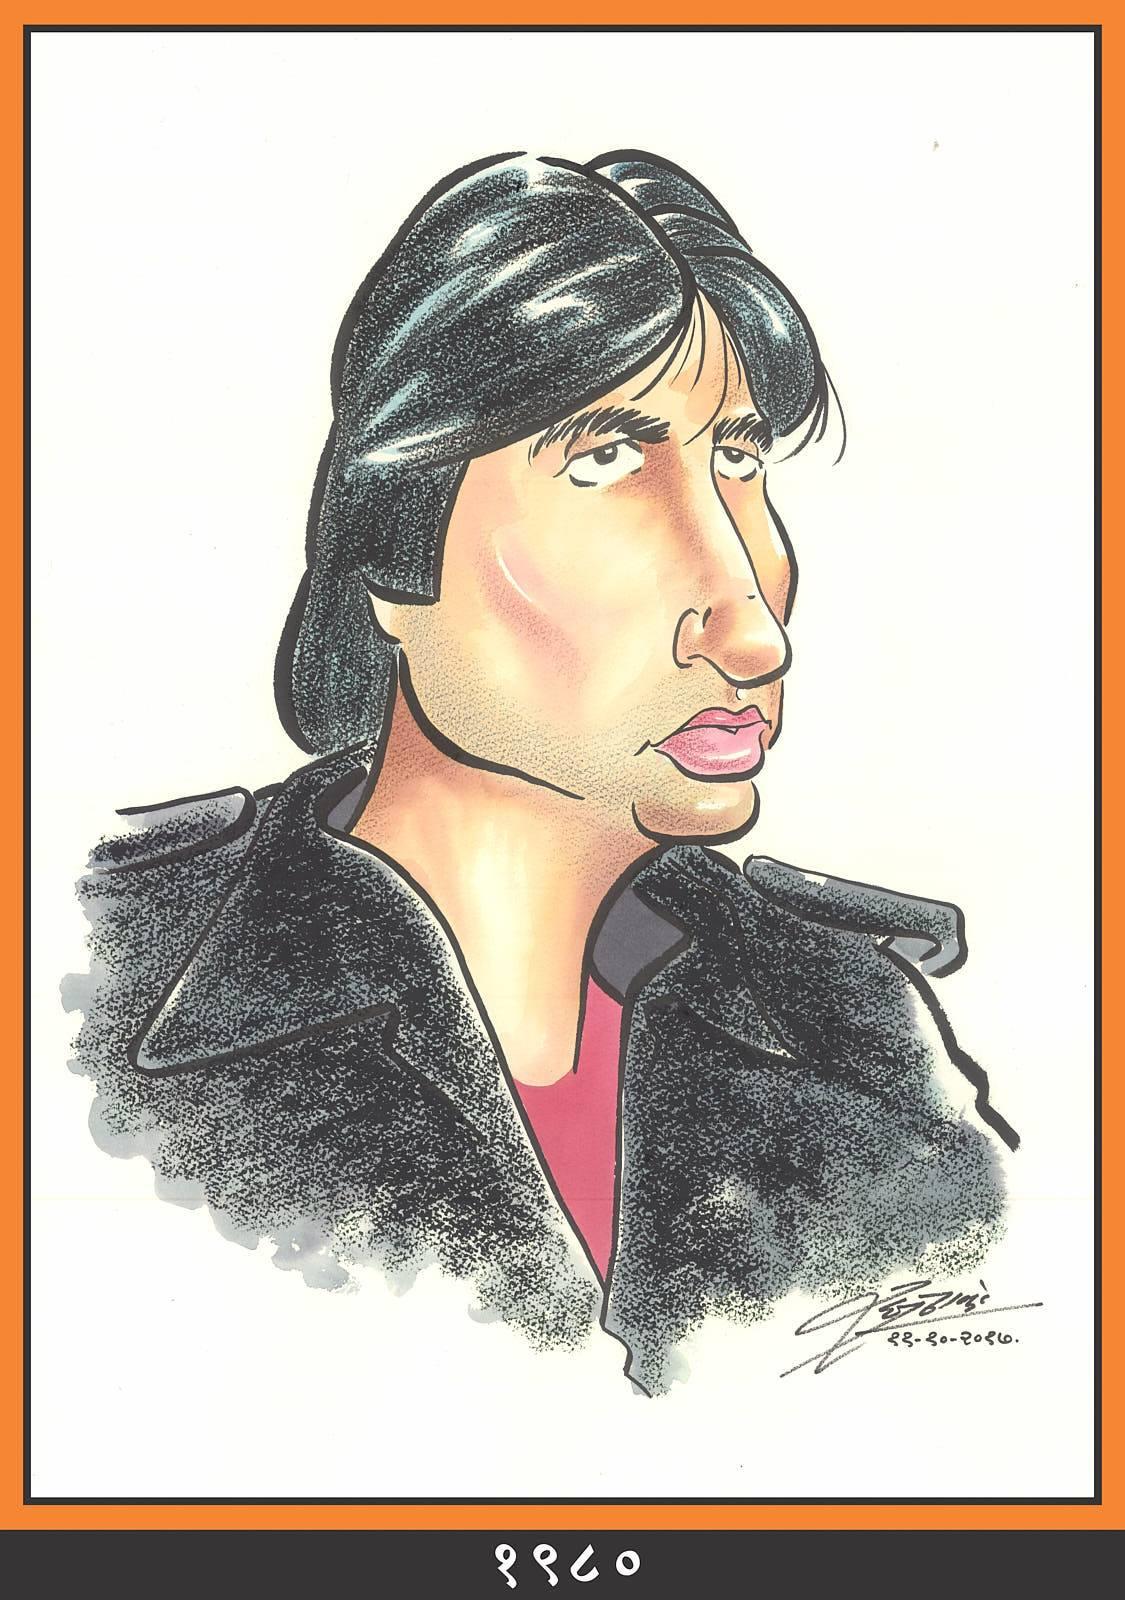 Raj Thackeray wishes Amitabh Bachchan through his caricatures